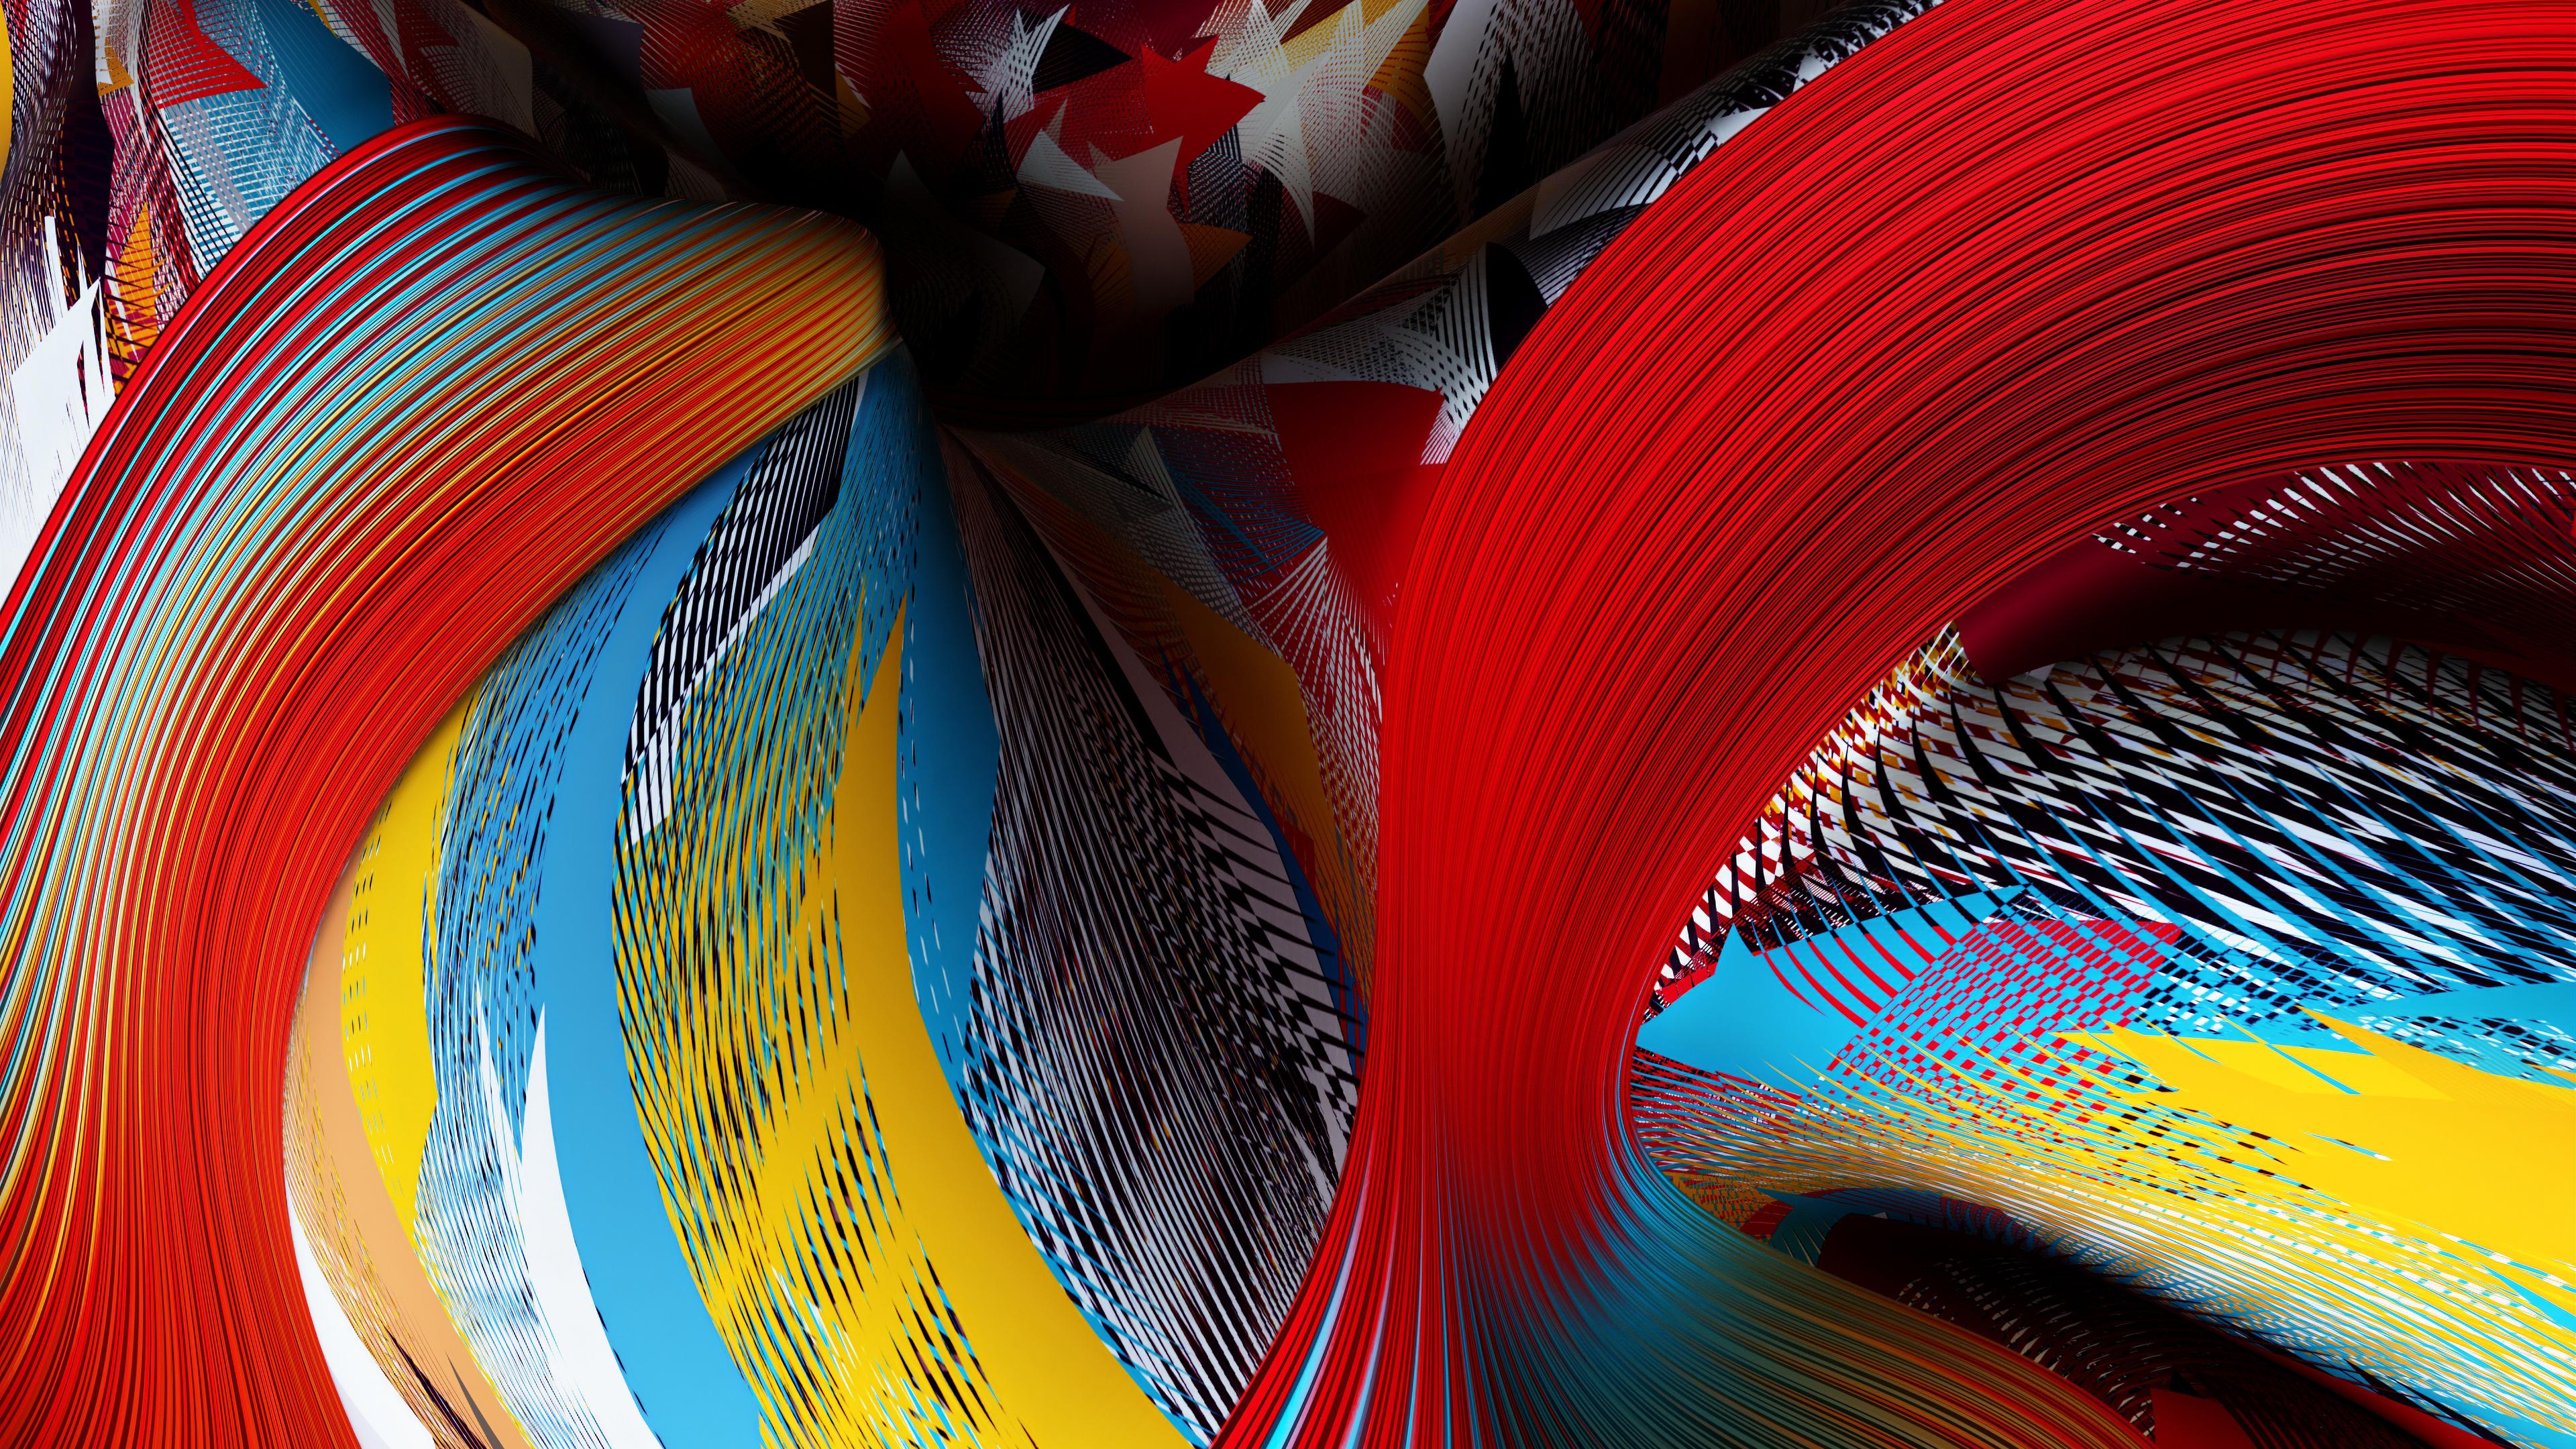 abstract illustration 1563221533 - Abstract Illustration - illustration wallpapers, hd-wallpapers, digital art wallpapers, behance wallpapers, artwork wallpapers, artist wallpapers, abstract wallpapers, 4k-wallpapers